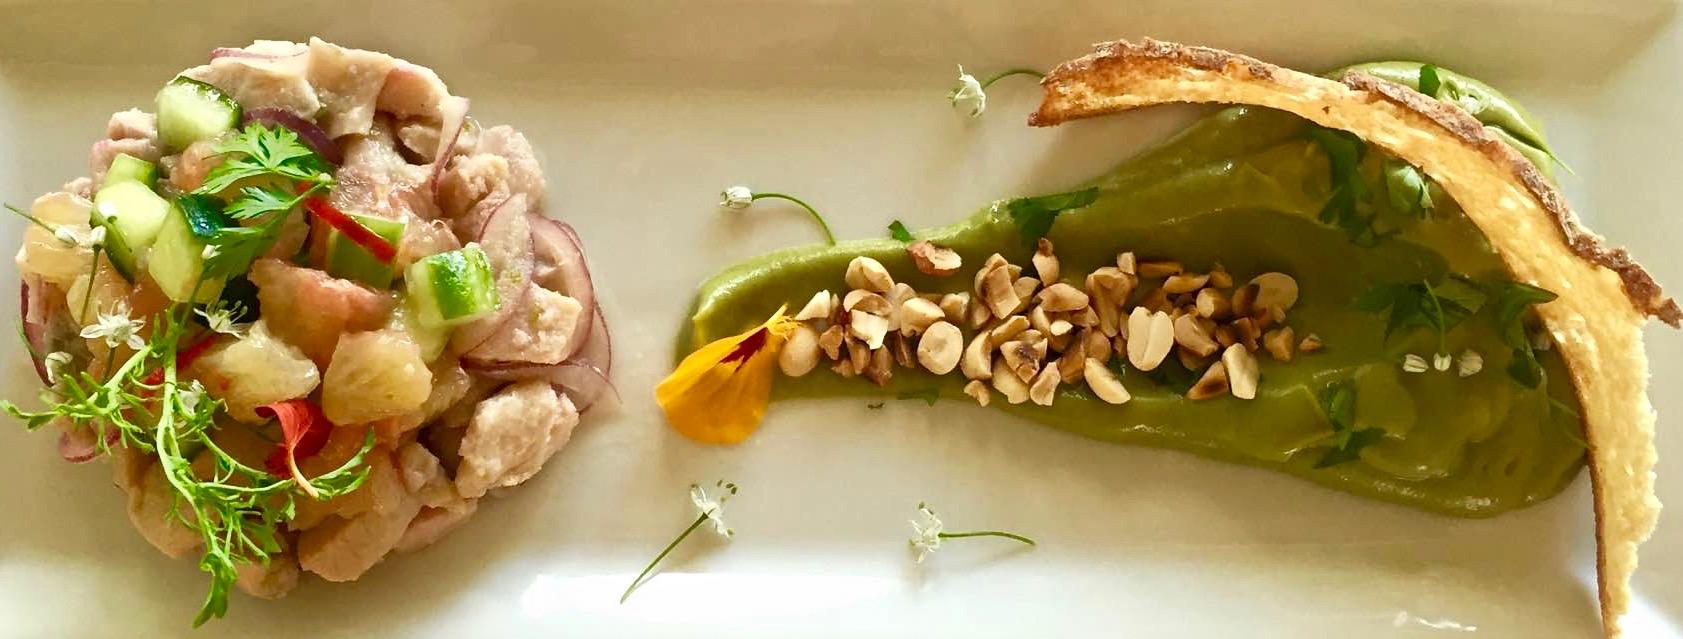 Thai-inspired Tilapia Ceviche with Avocado, Pomelo & Roasted Peanuts.